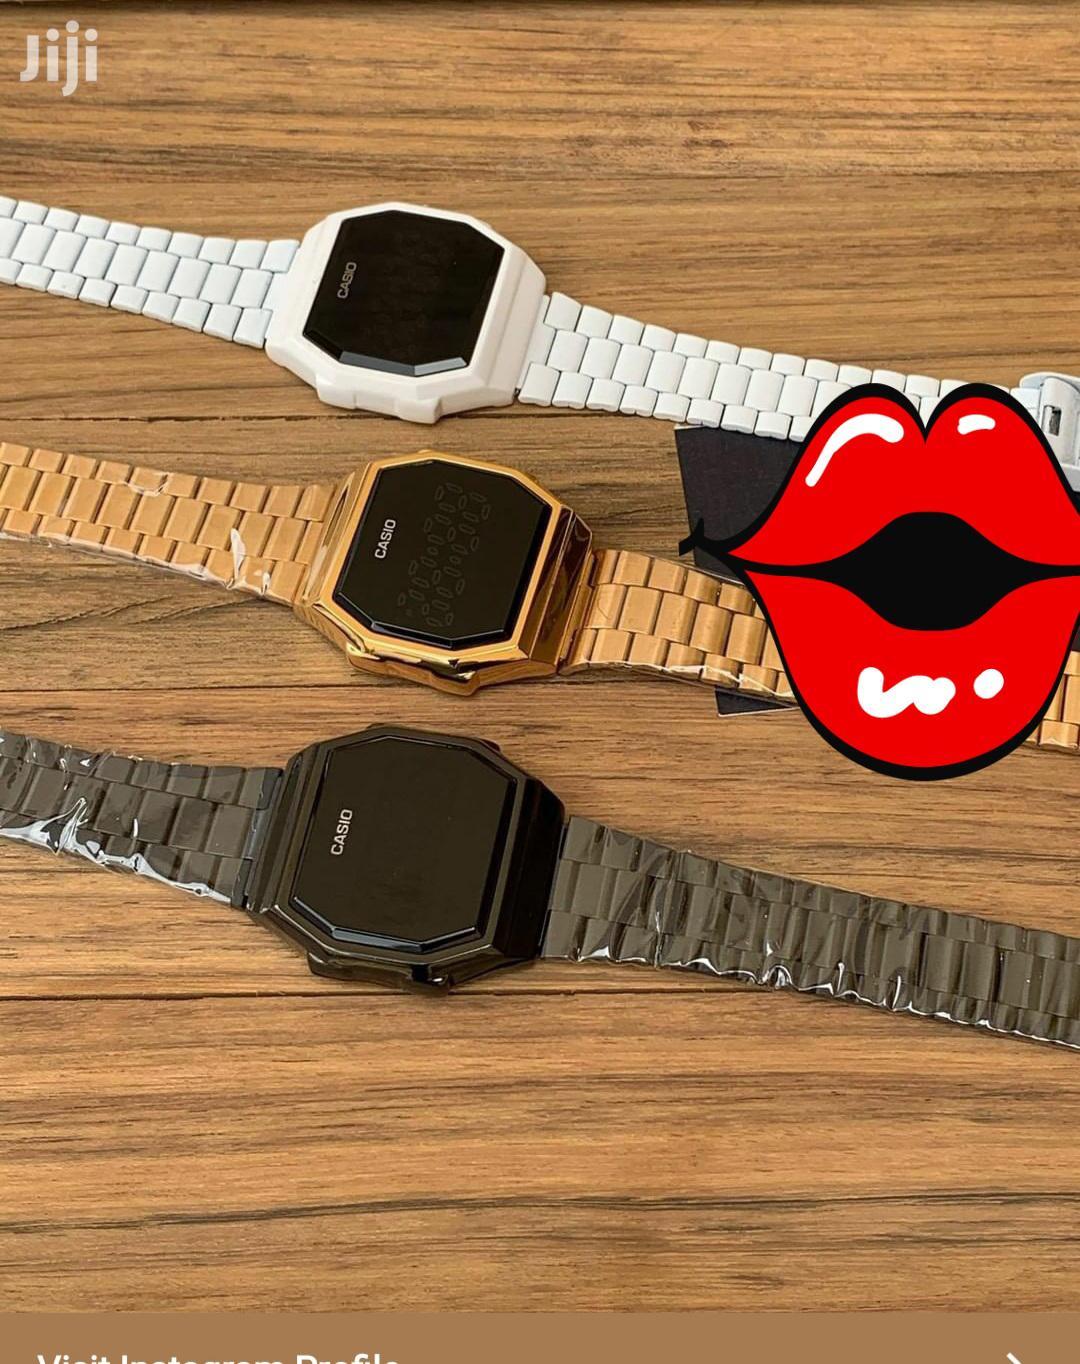 Casio Watch In A Box, Whosale Price For 1 | Watches for sale in Kumasi Metropolitan, Ashanti, Ghana